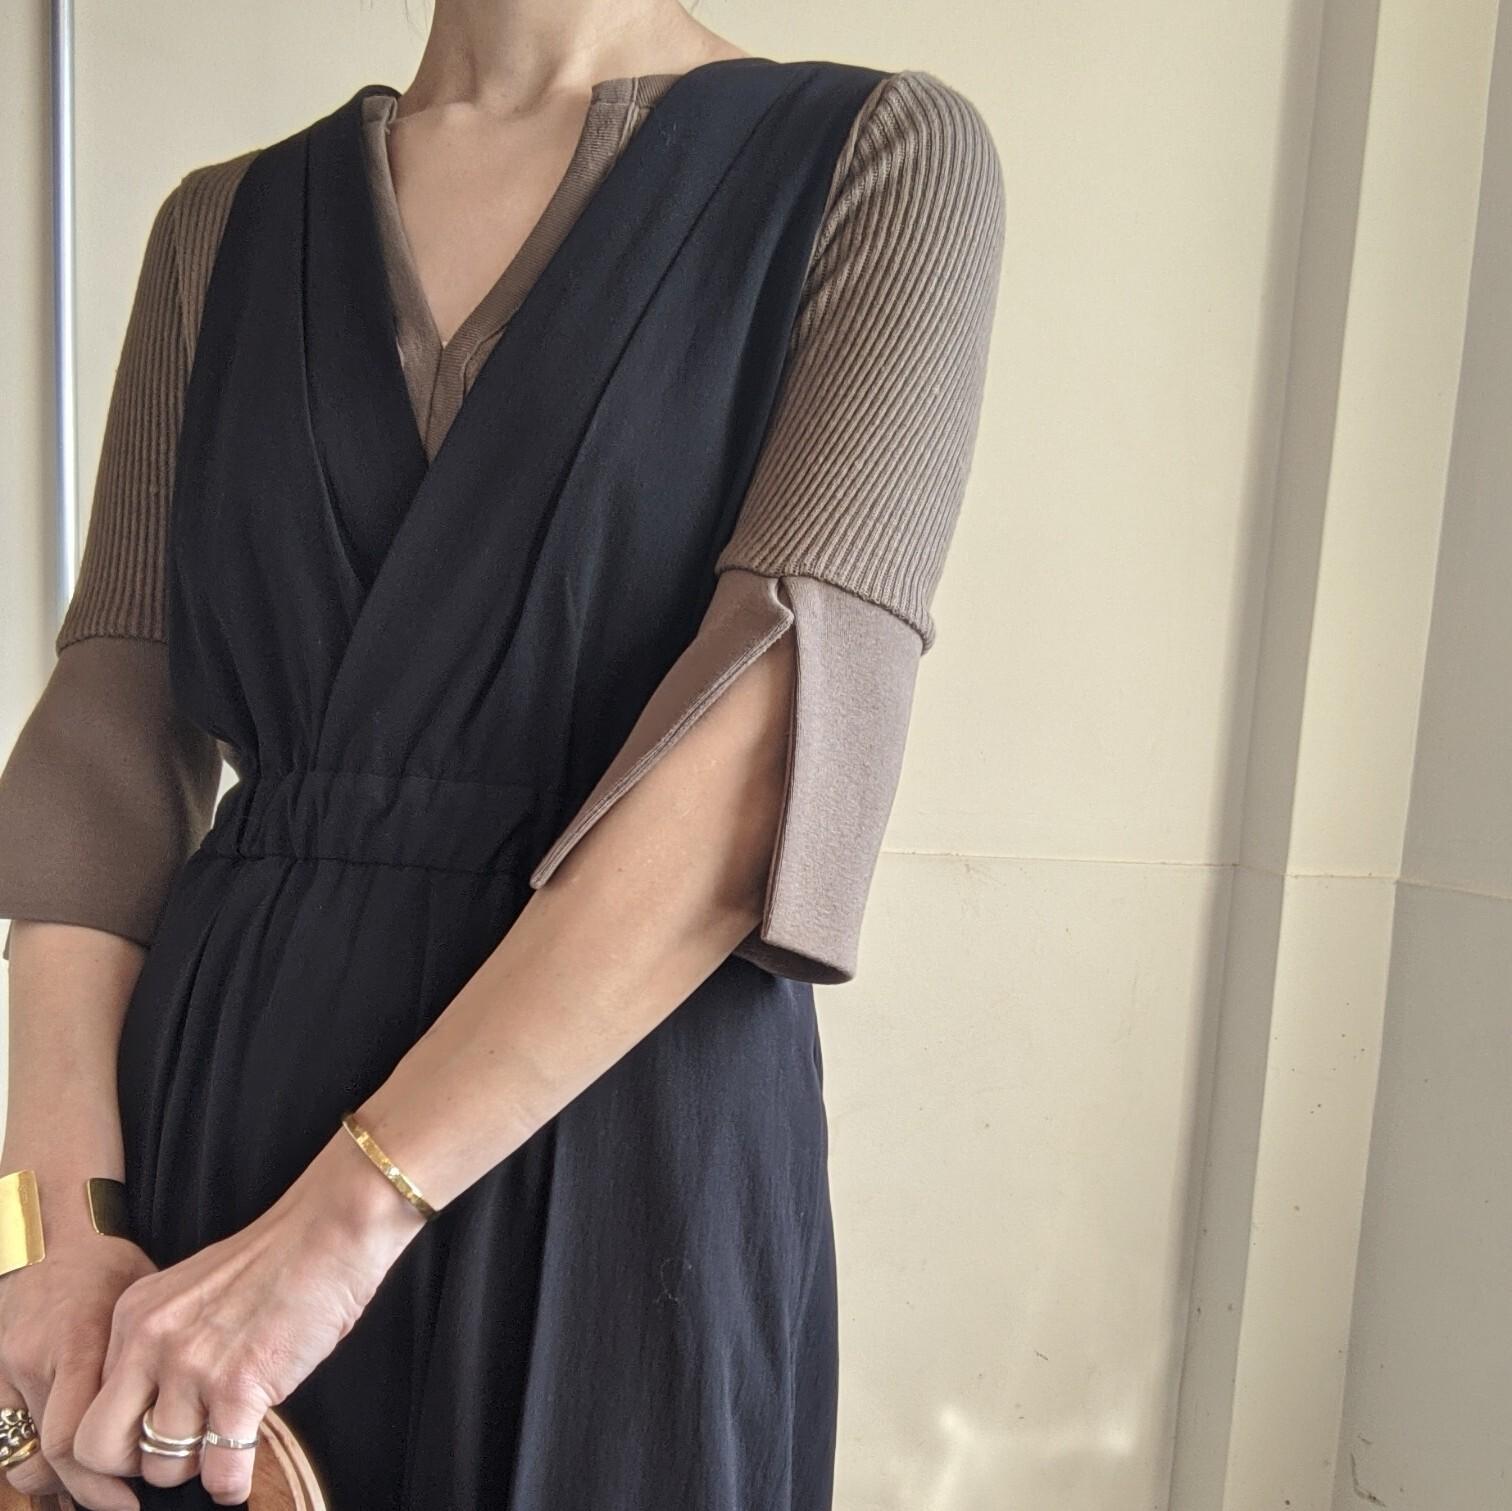 【 OTOÄA 】オトア SALOPETTE SKIRT / サロペットスカート BLACK